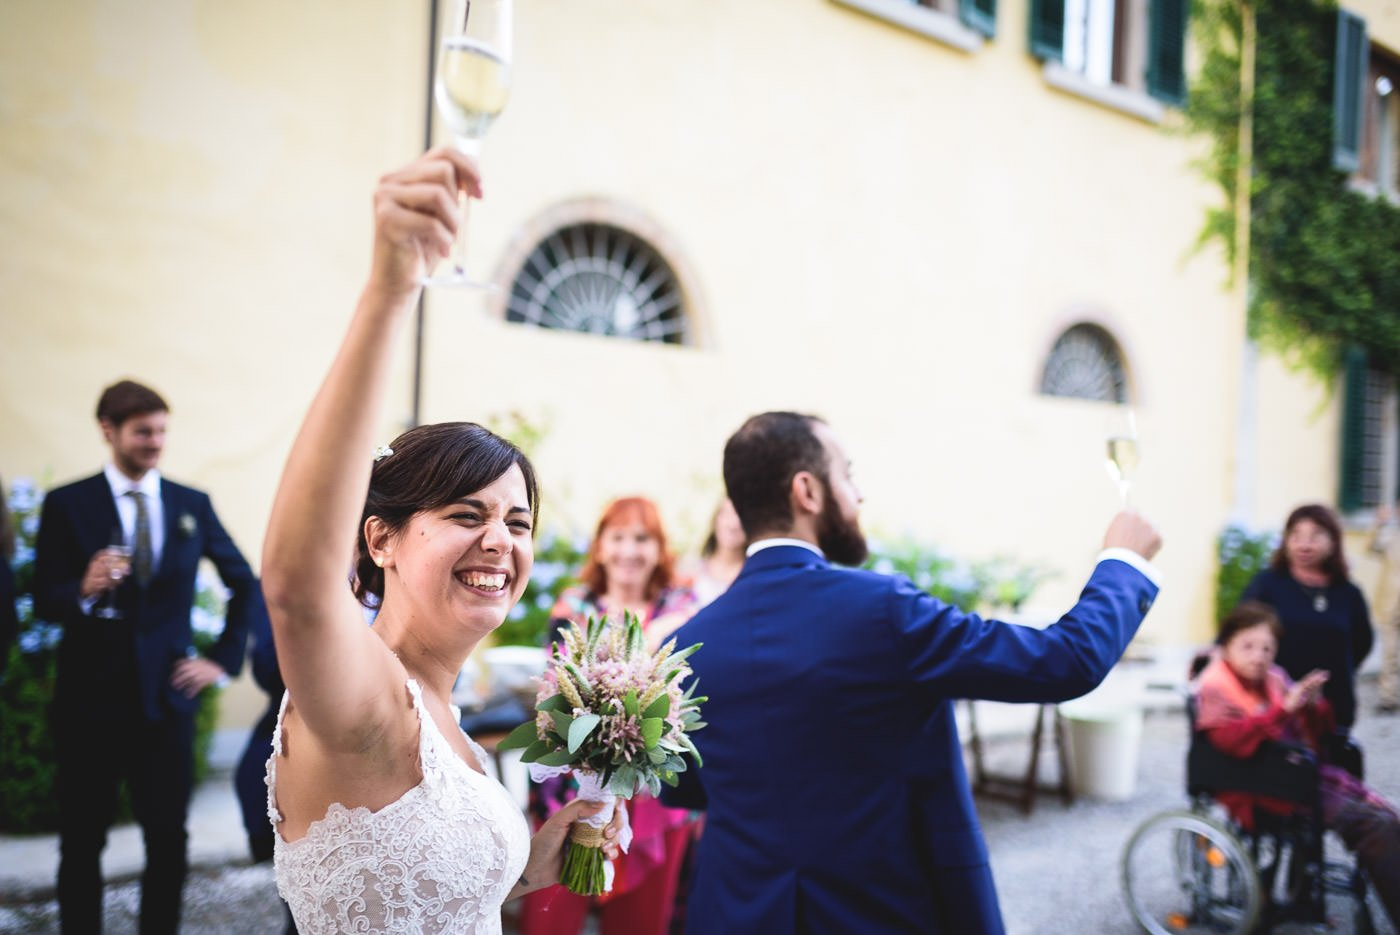 Matrimonio Giulia & Federico 09_15 – Alessio Nobili Photographer-41